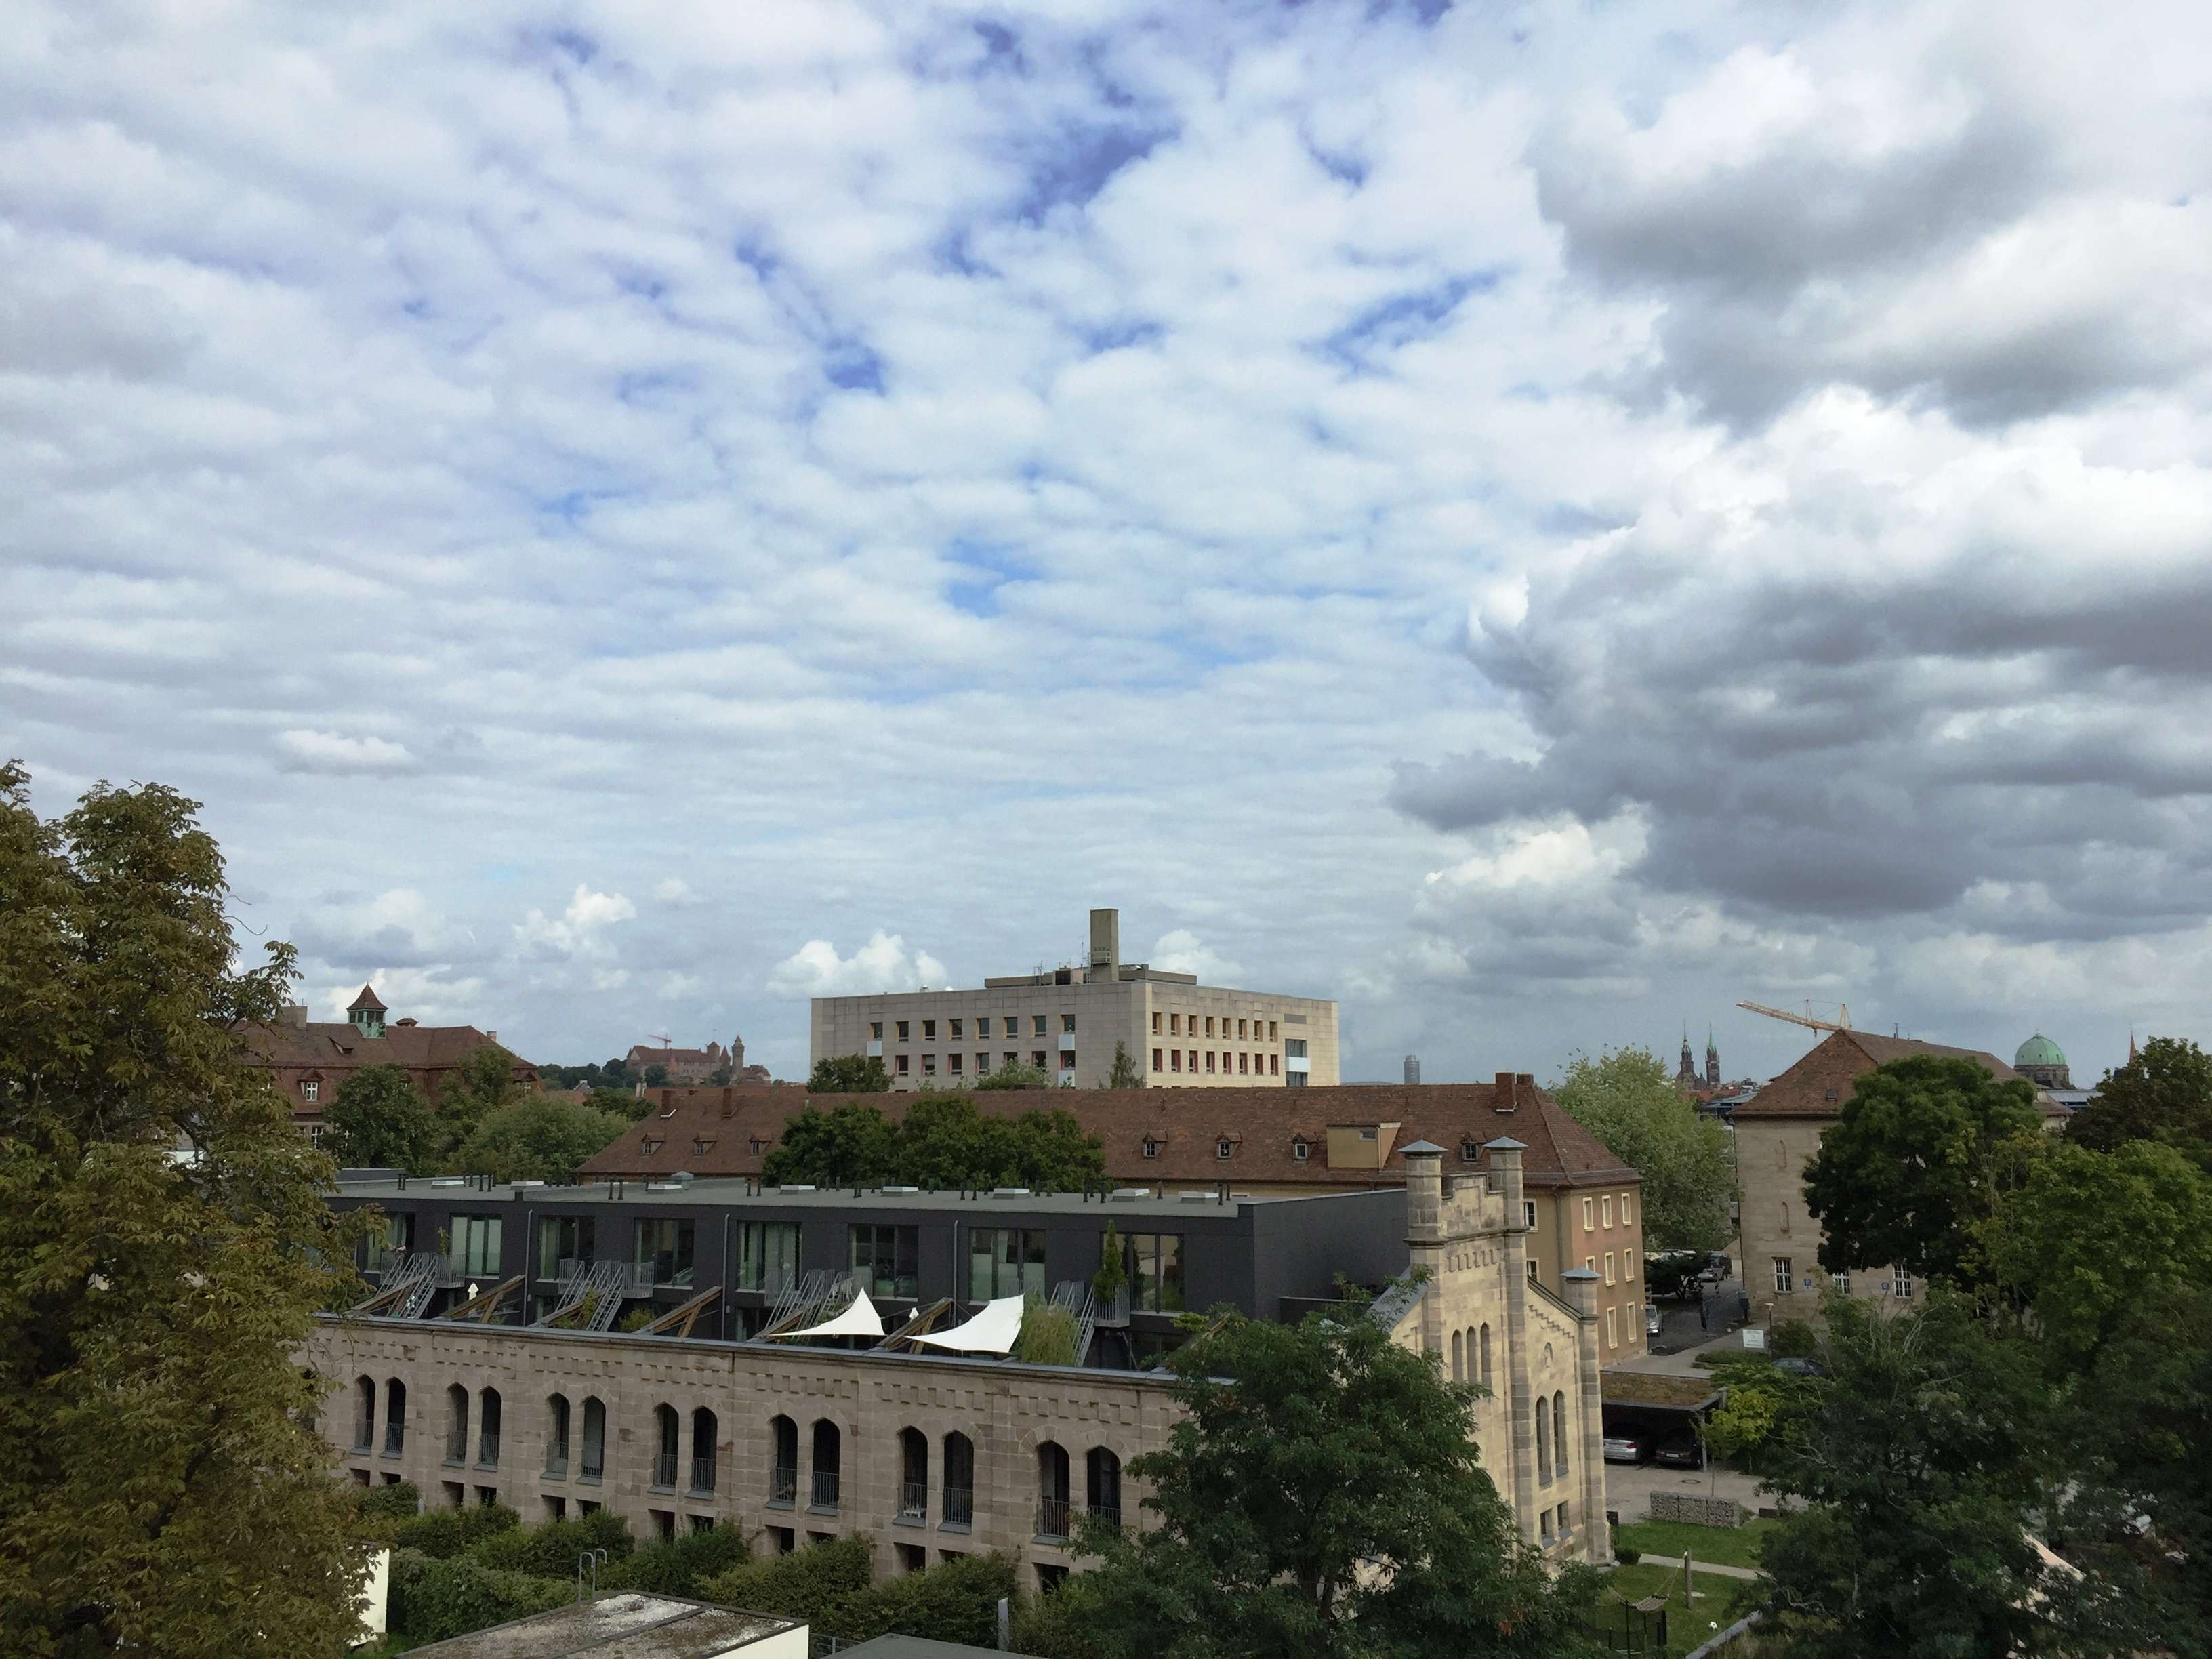 *provisionsfrei* möbliertes 1-Zi Apartment in zentraler Lage in Himpfelshof (Nürnberg)